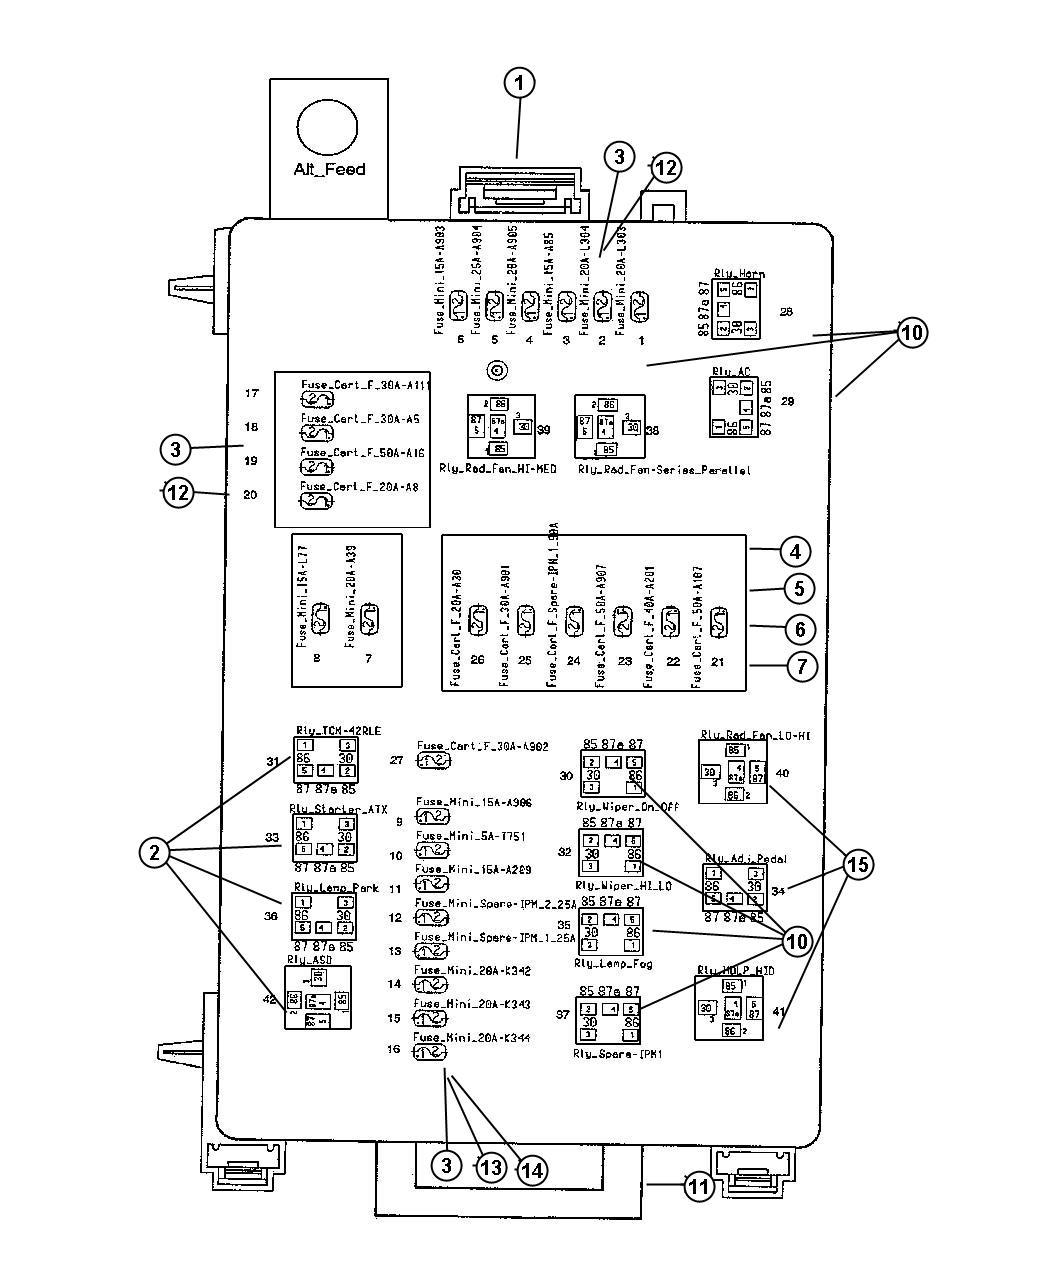 TS_2469] Chrysler 300 Fuse Box Diagram In Addition 2006 Chrysler 300 Fuse  BoxSarc Basi Pneu Coun Boapu Mohammedshrine Librar Wiring 101